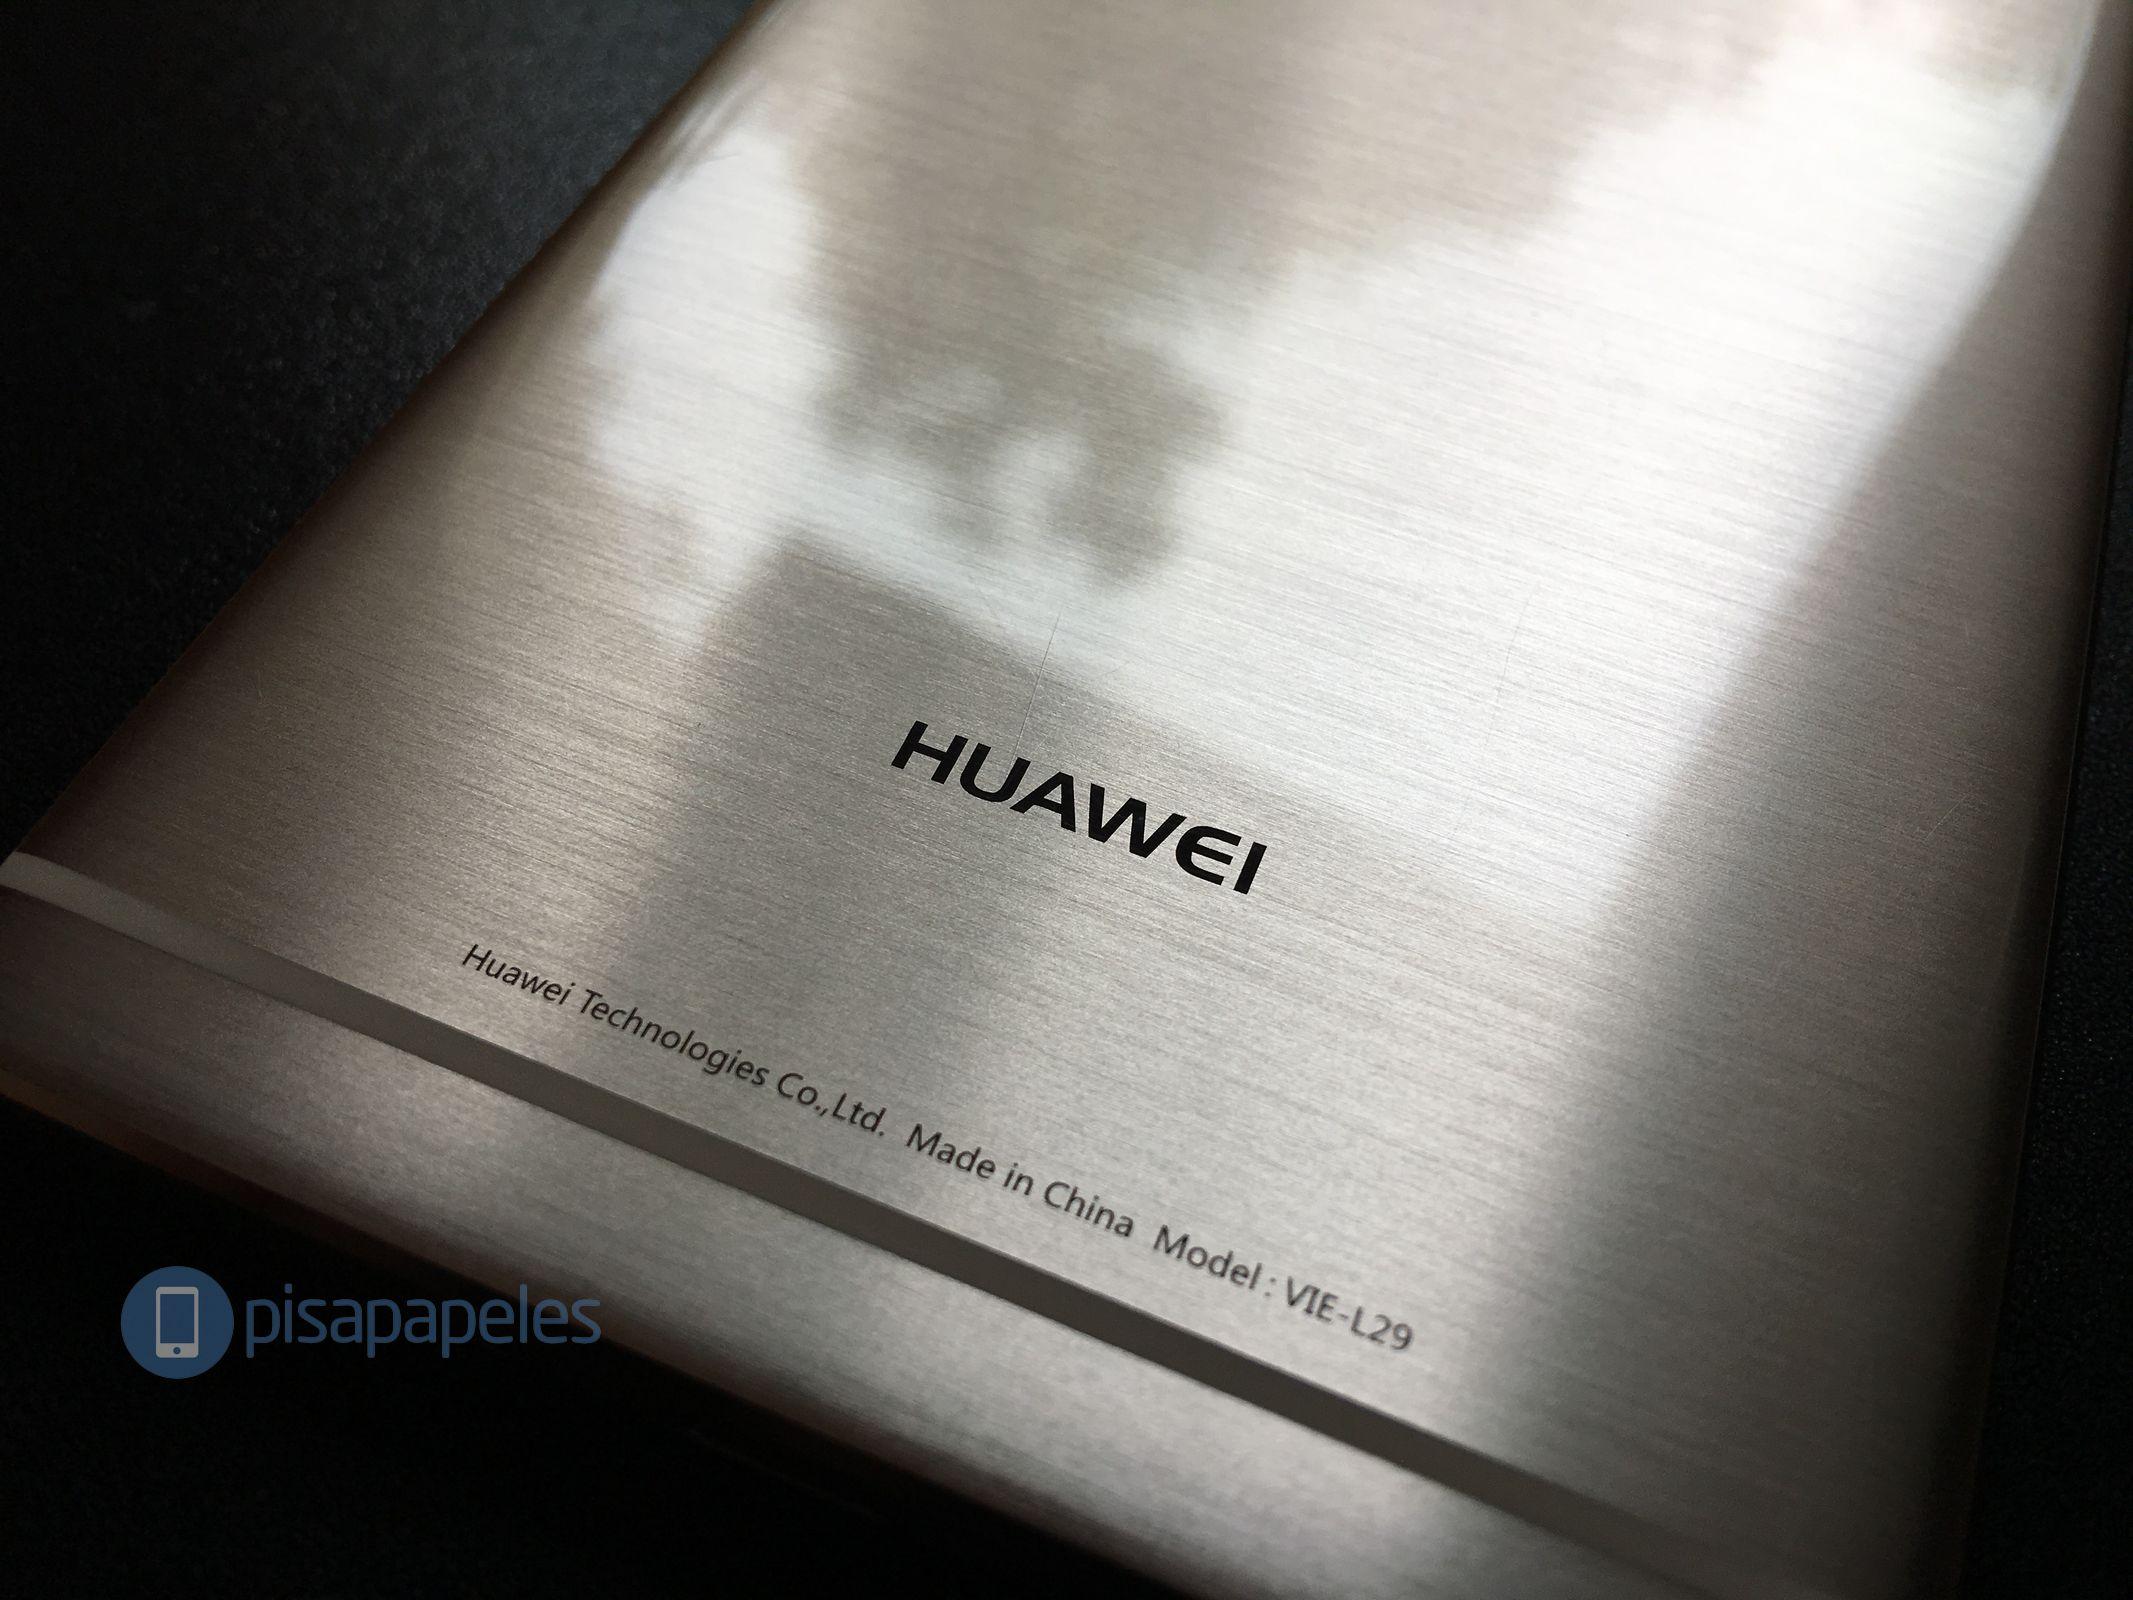 huawei-p9-plus-pisapapeles-net_17